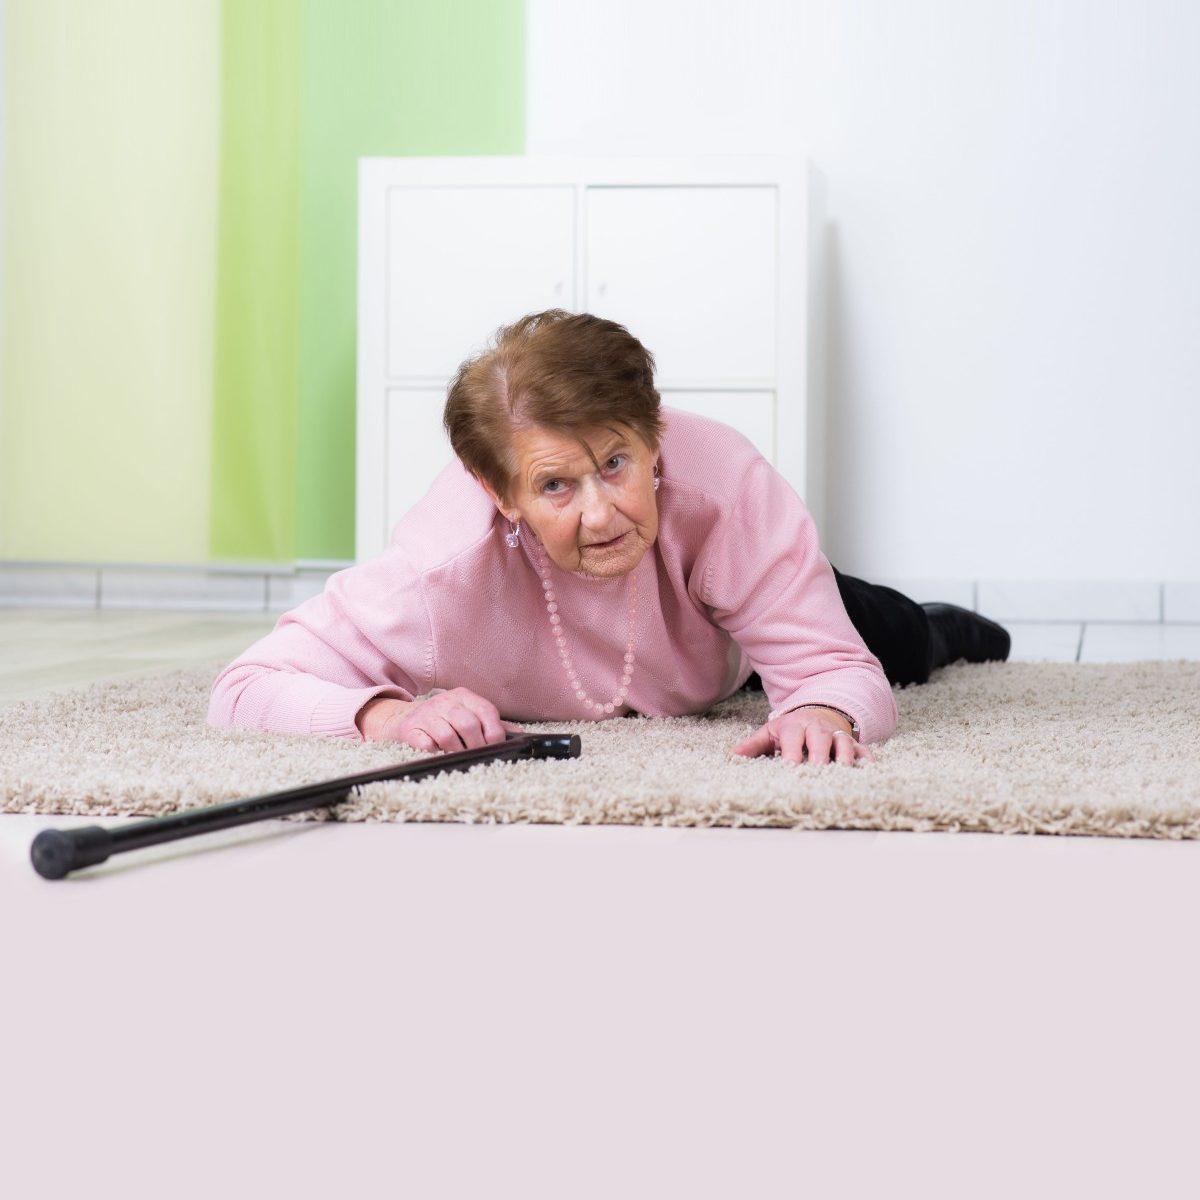 In Balance bleiben: Sturzprophylaxe bei Senioren